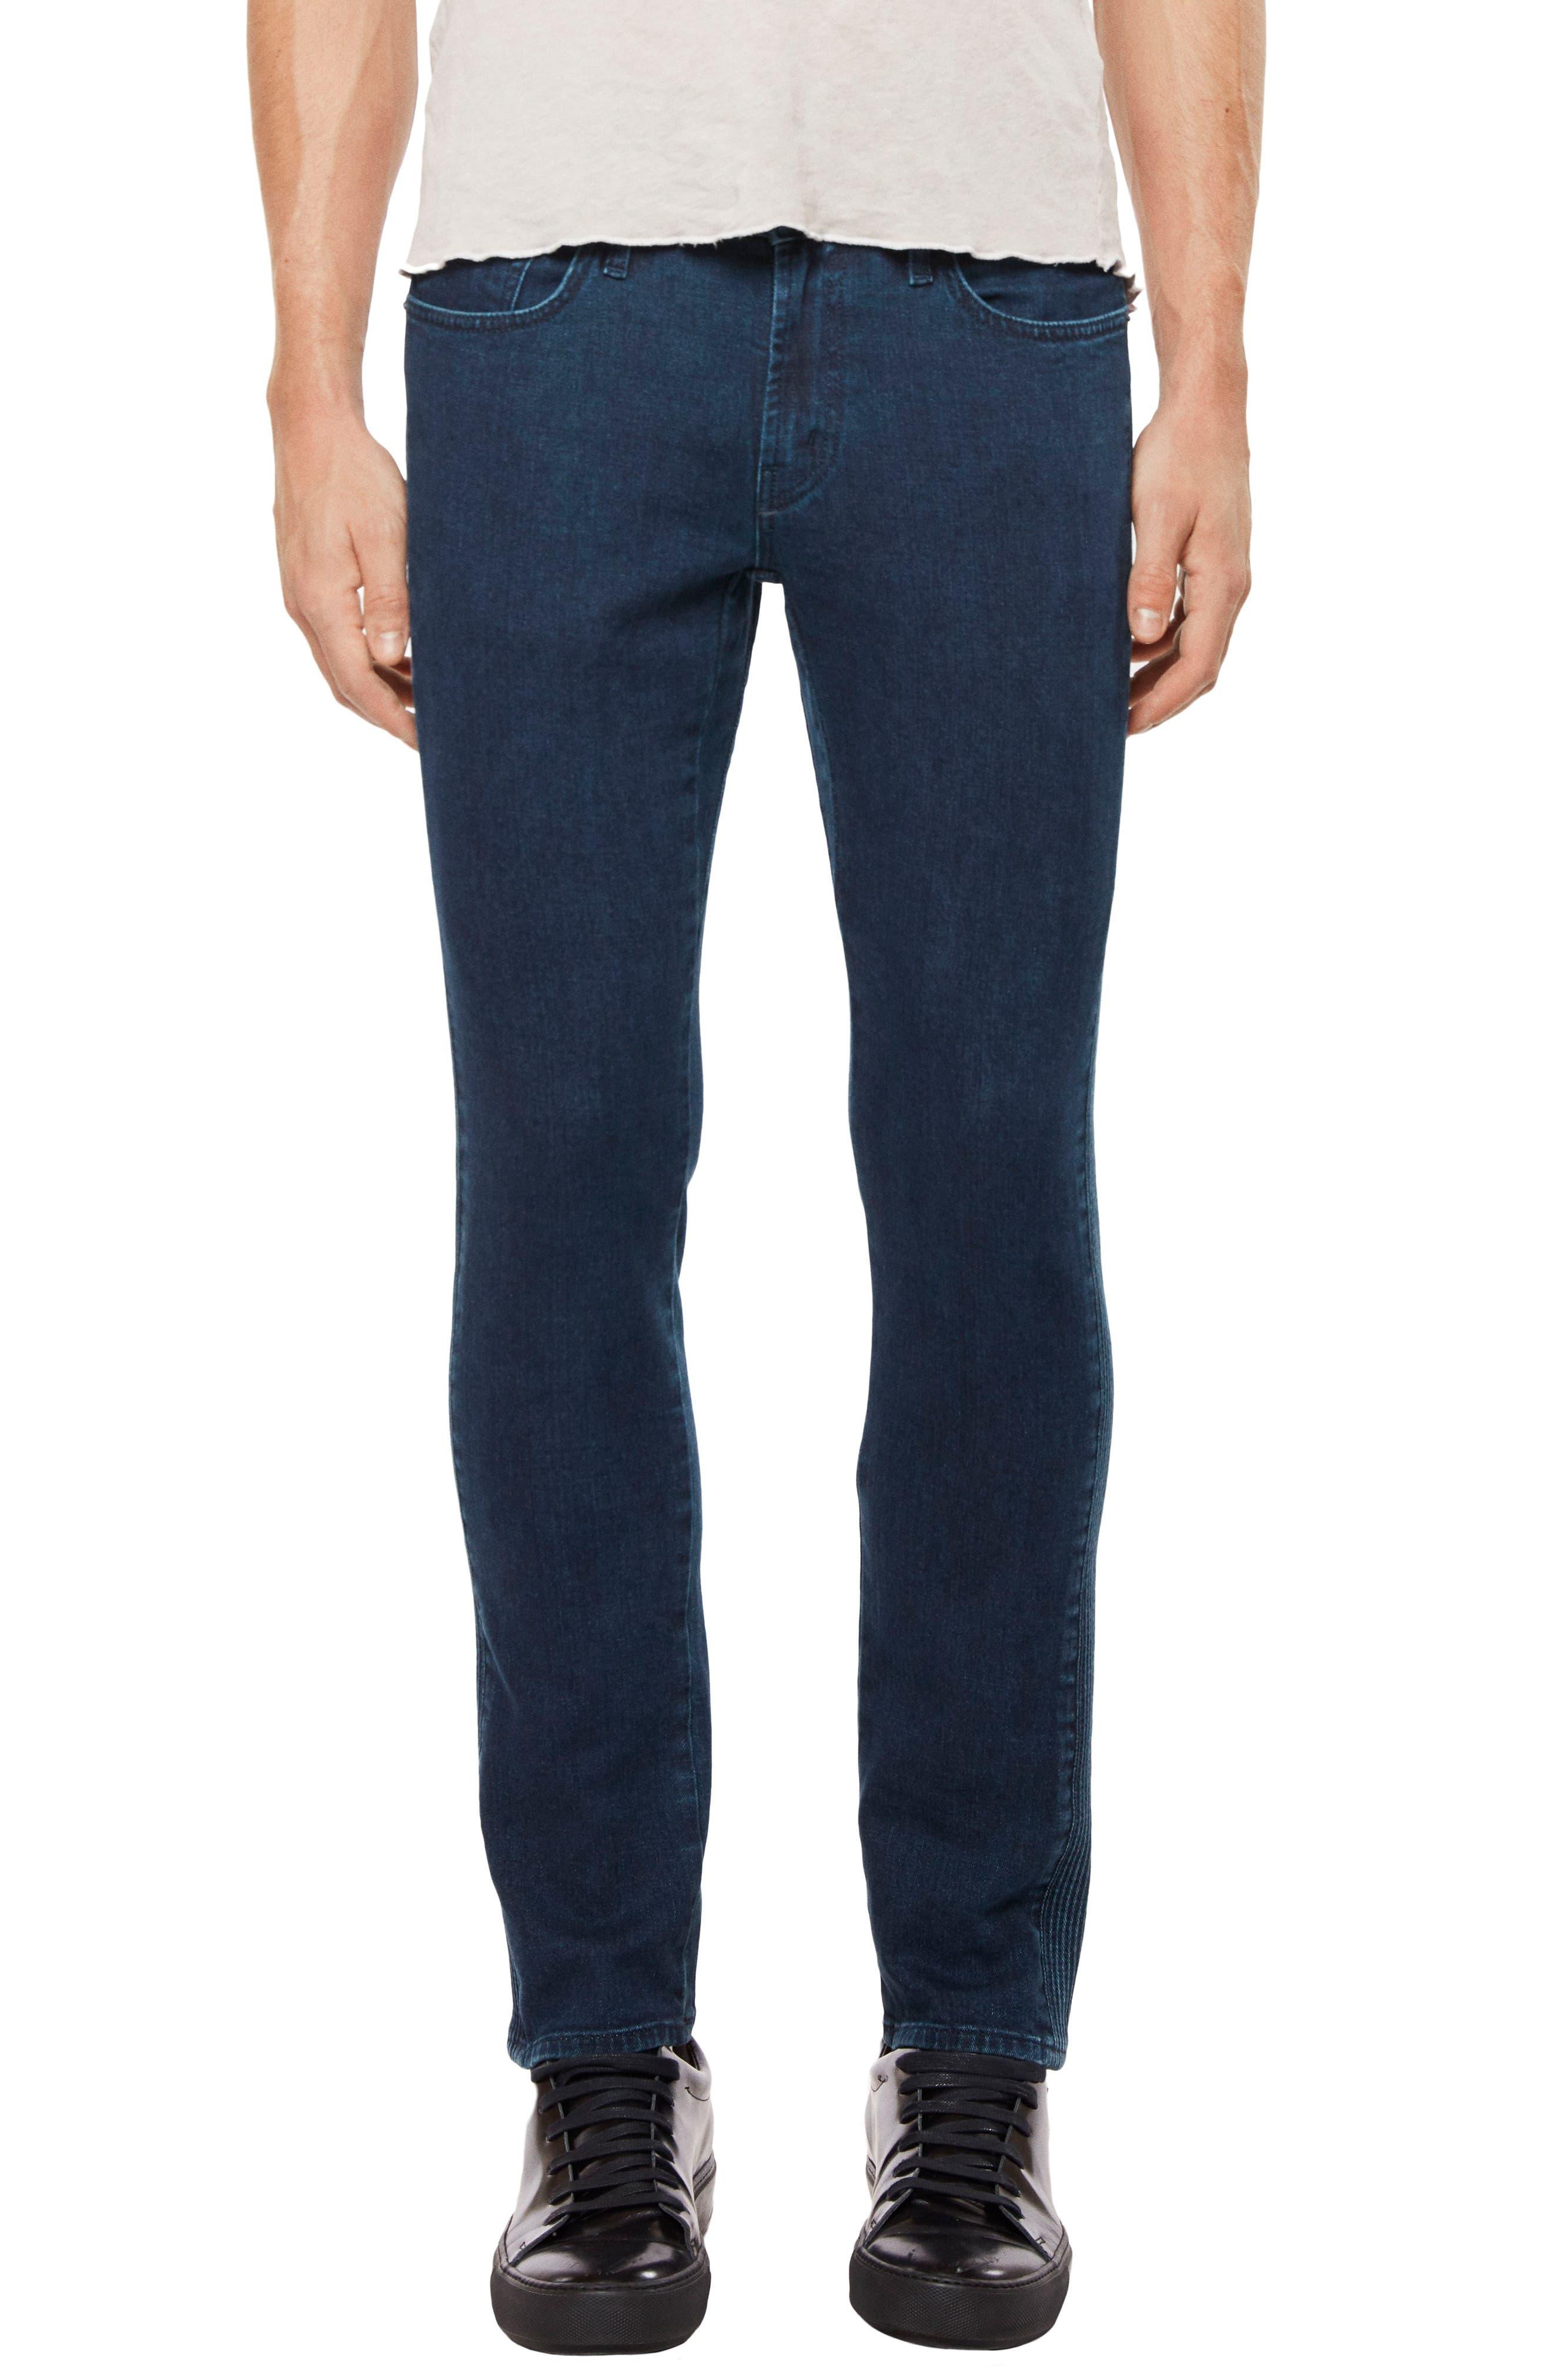 Moto Skinny Fit Jeans,                         Main,                         color, 403